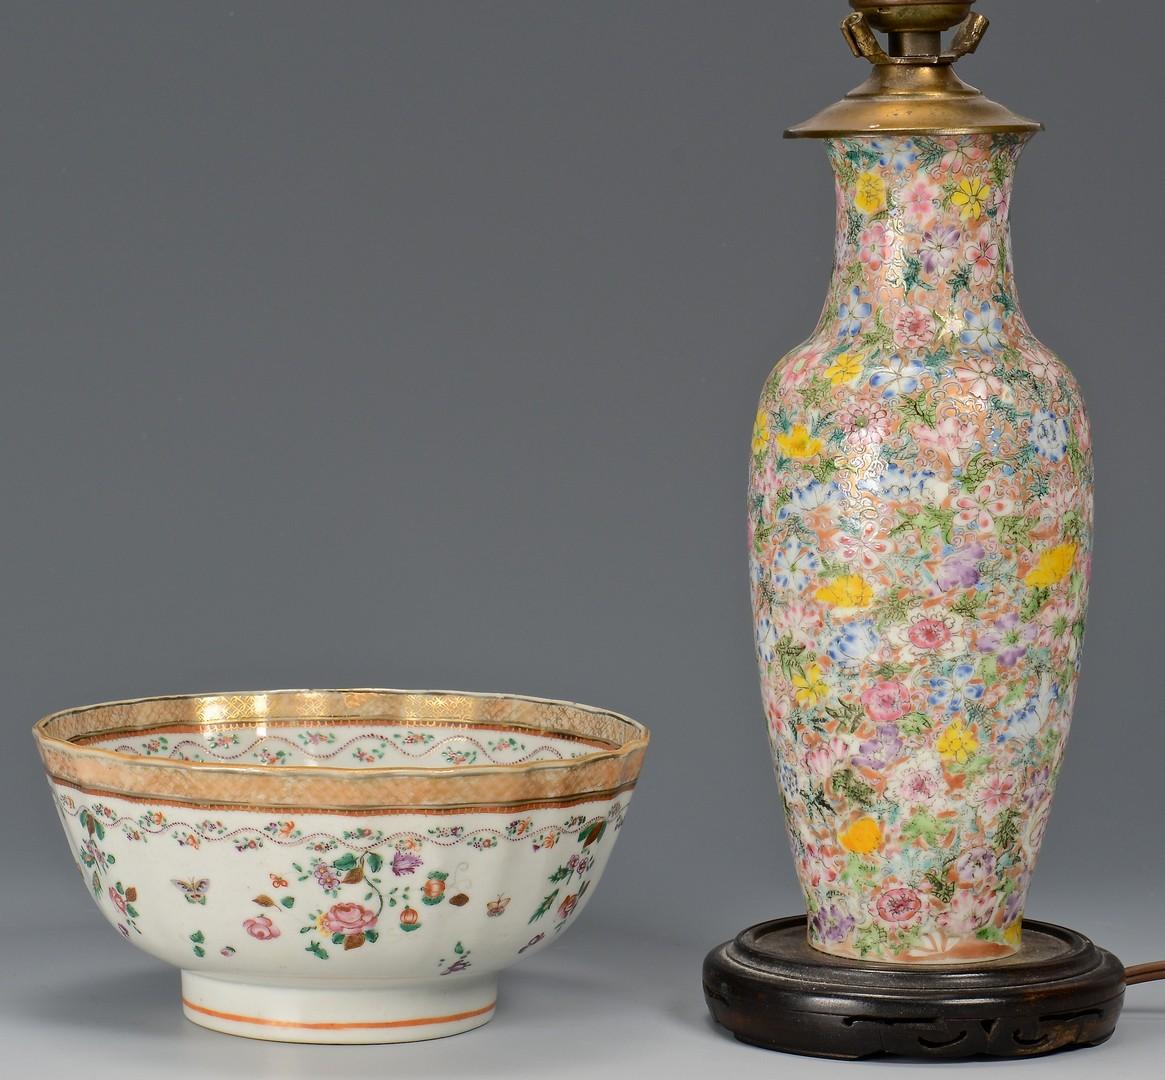 Lot 721: Chinese bowl, vase, and box